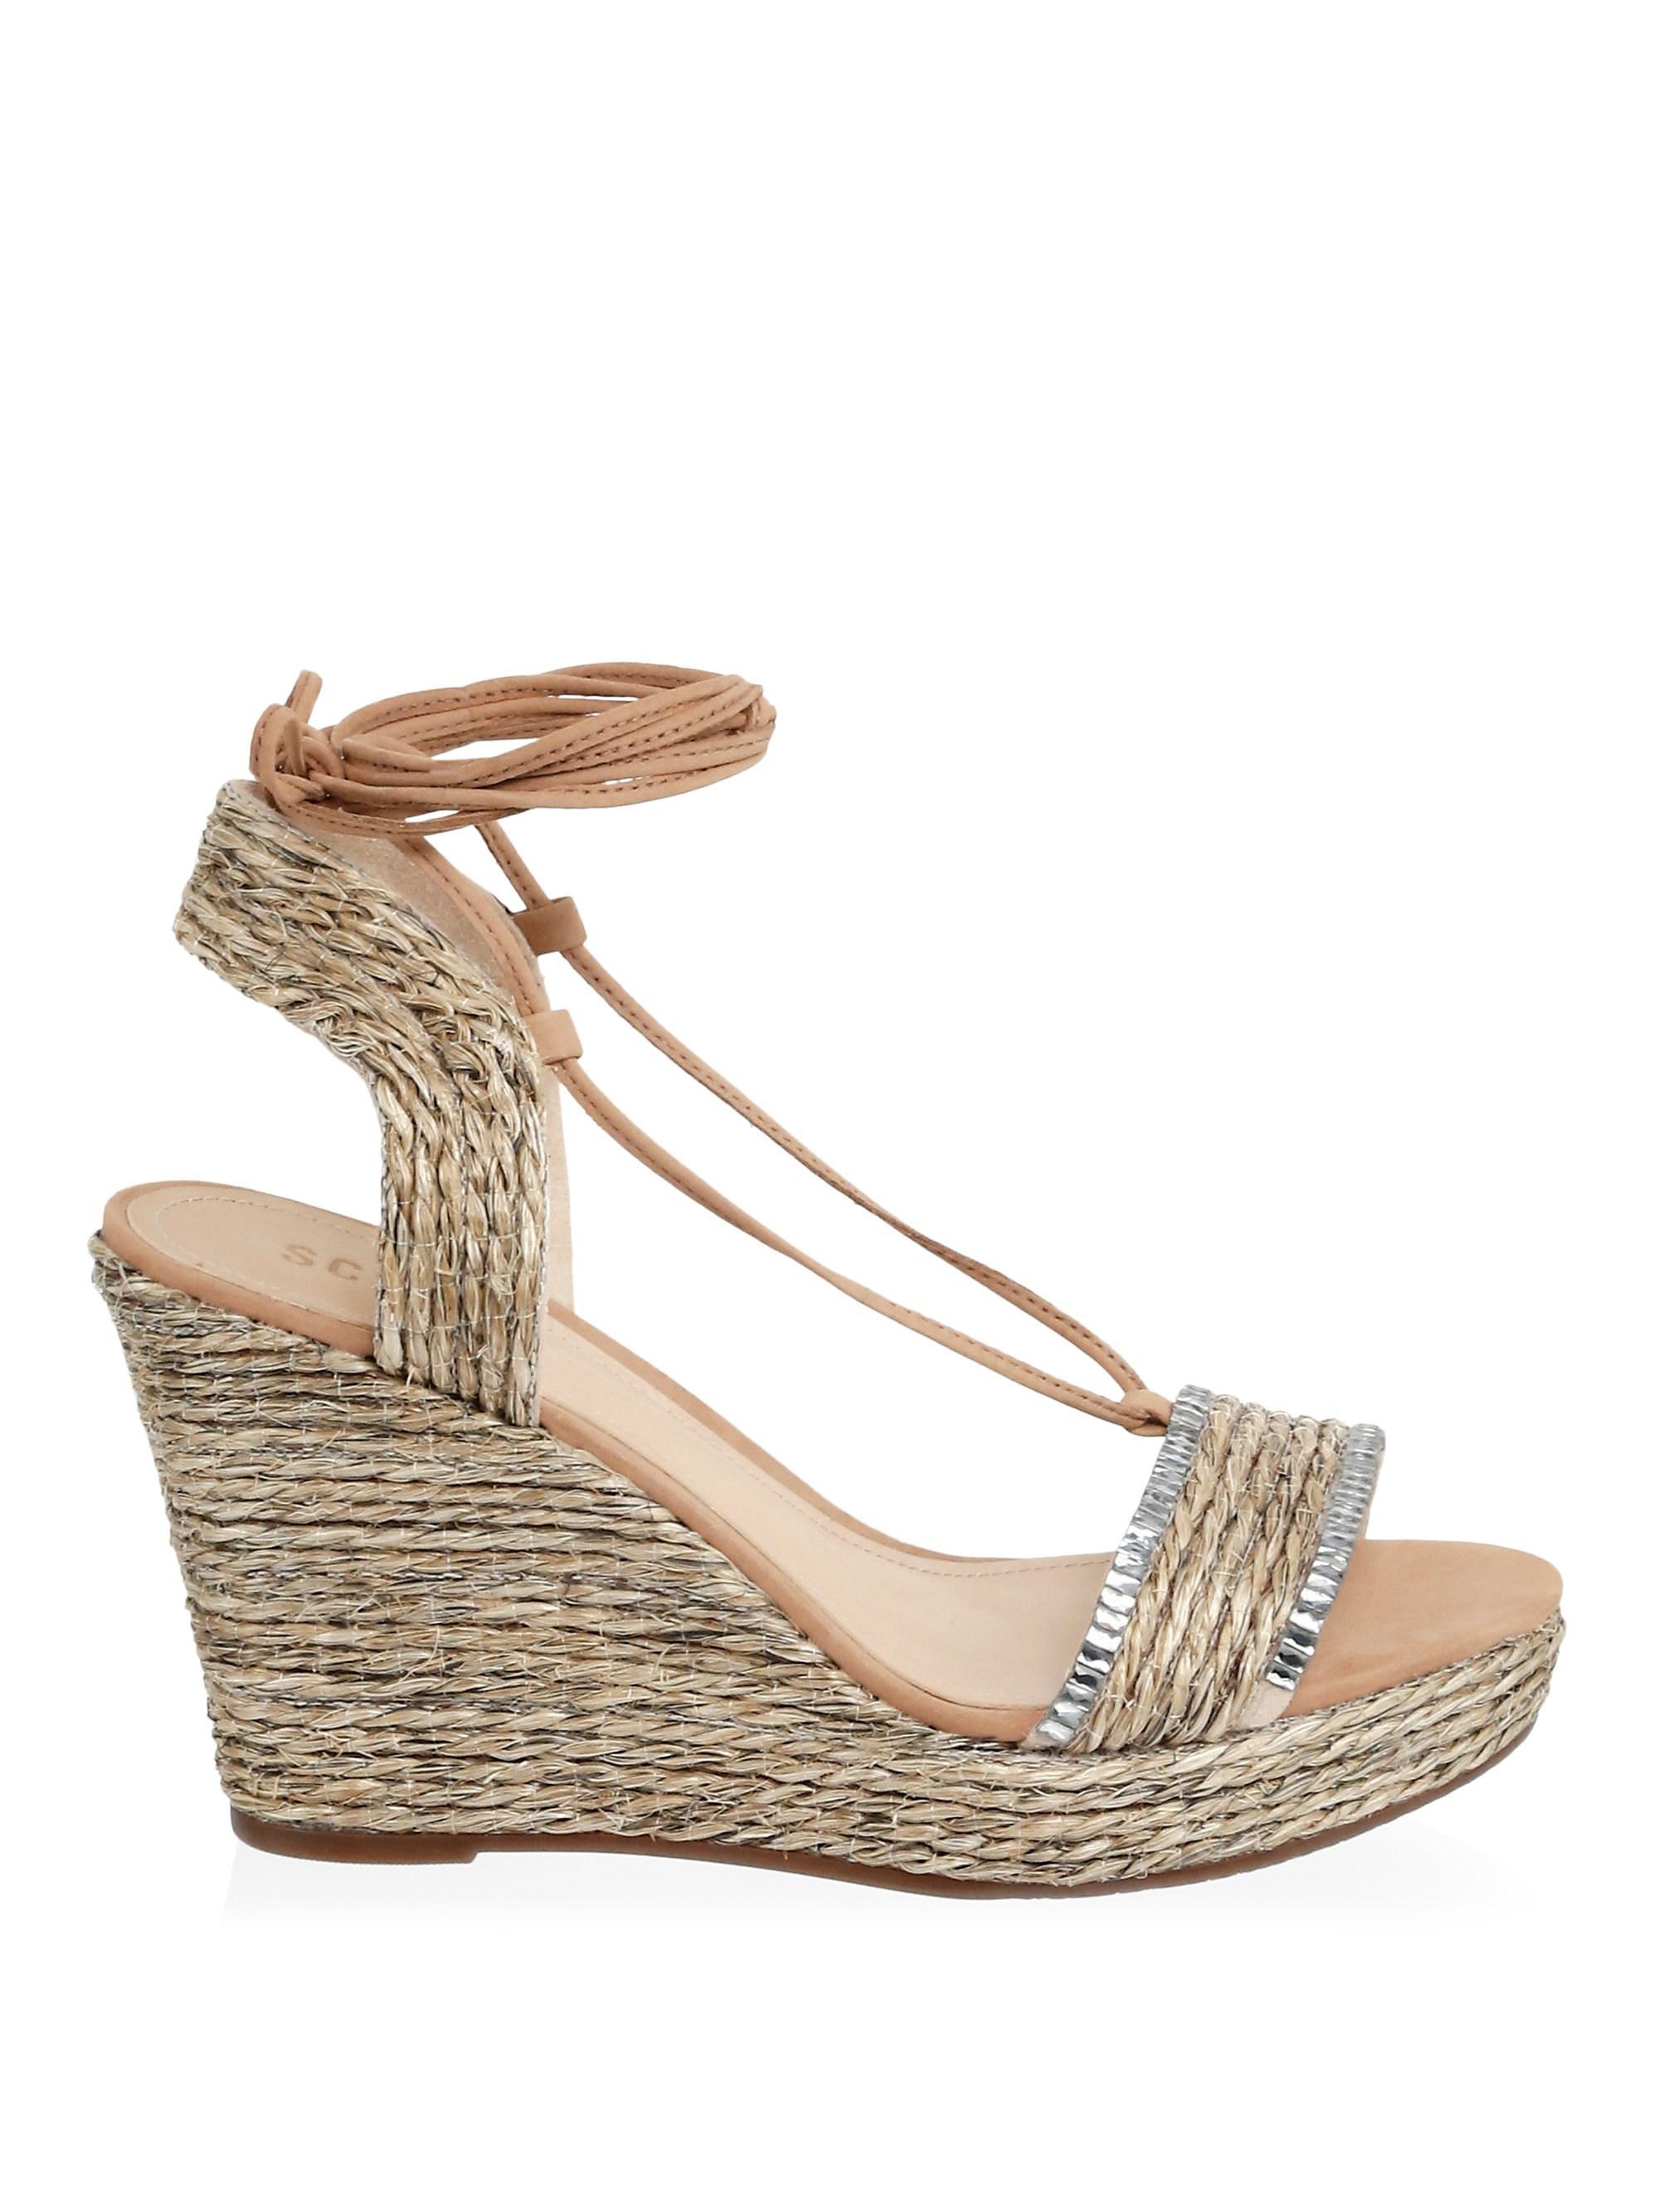 582c9f7e606 Lyst - Schutz Women s Vivian Wedge Sandals - Natural - Size 5.5 in ...